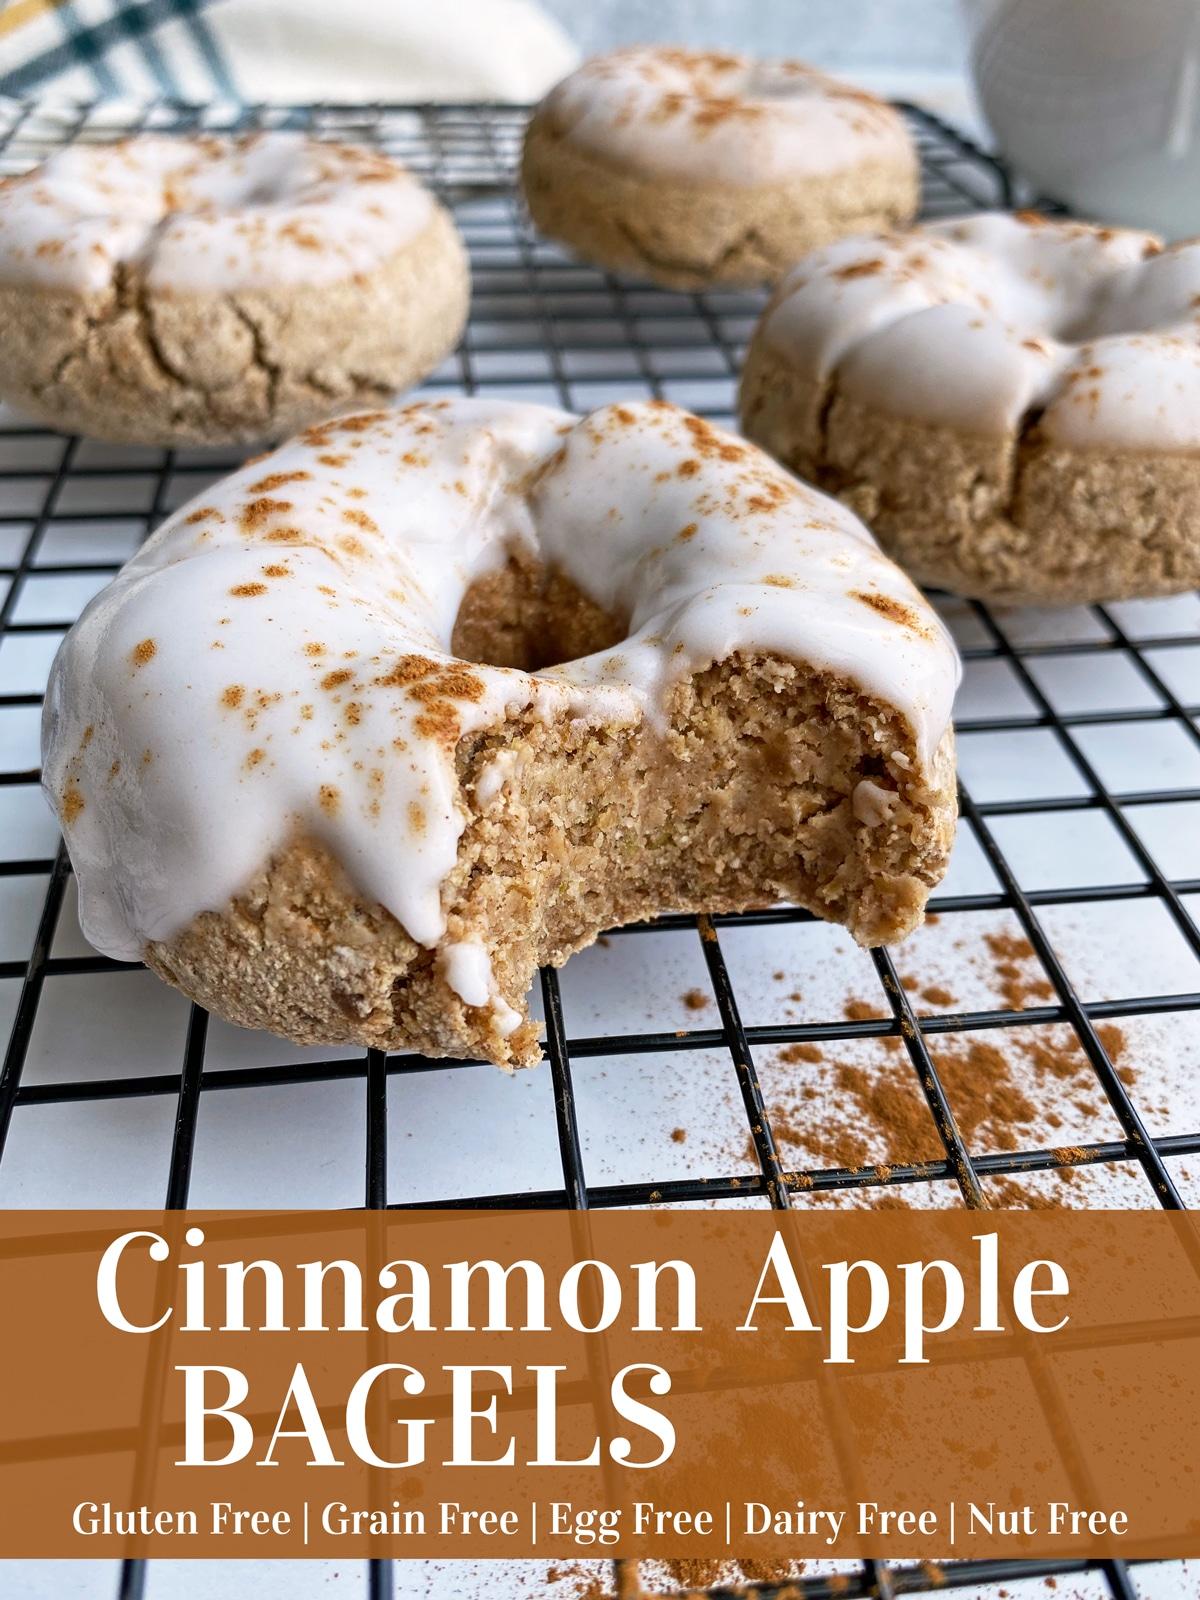 gluten-free-dairy-free-Cinnamon-Bagels